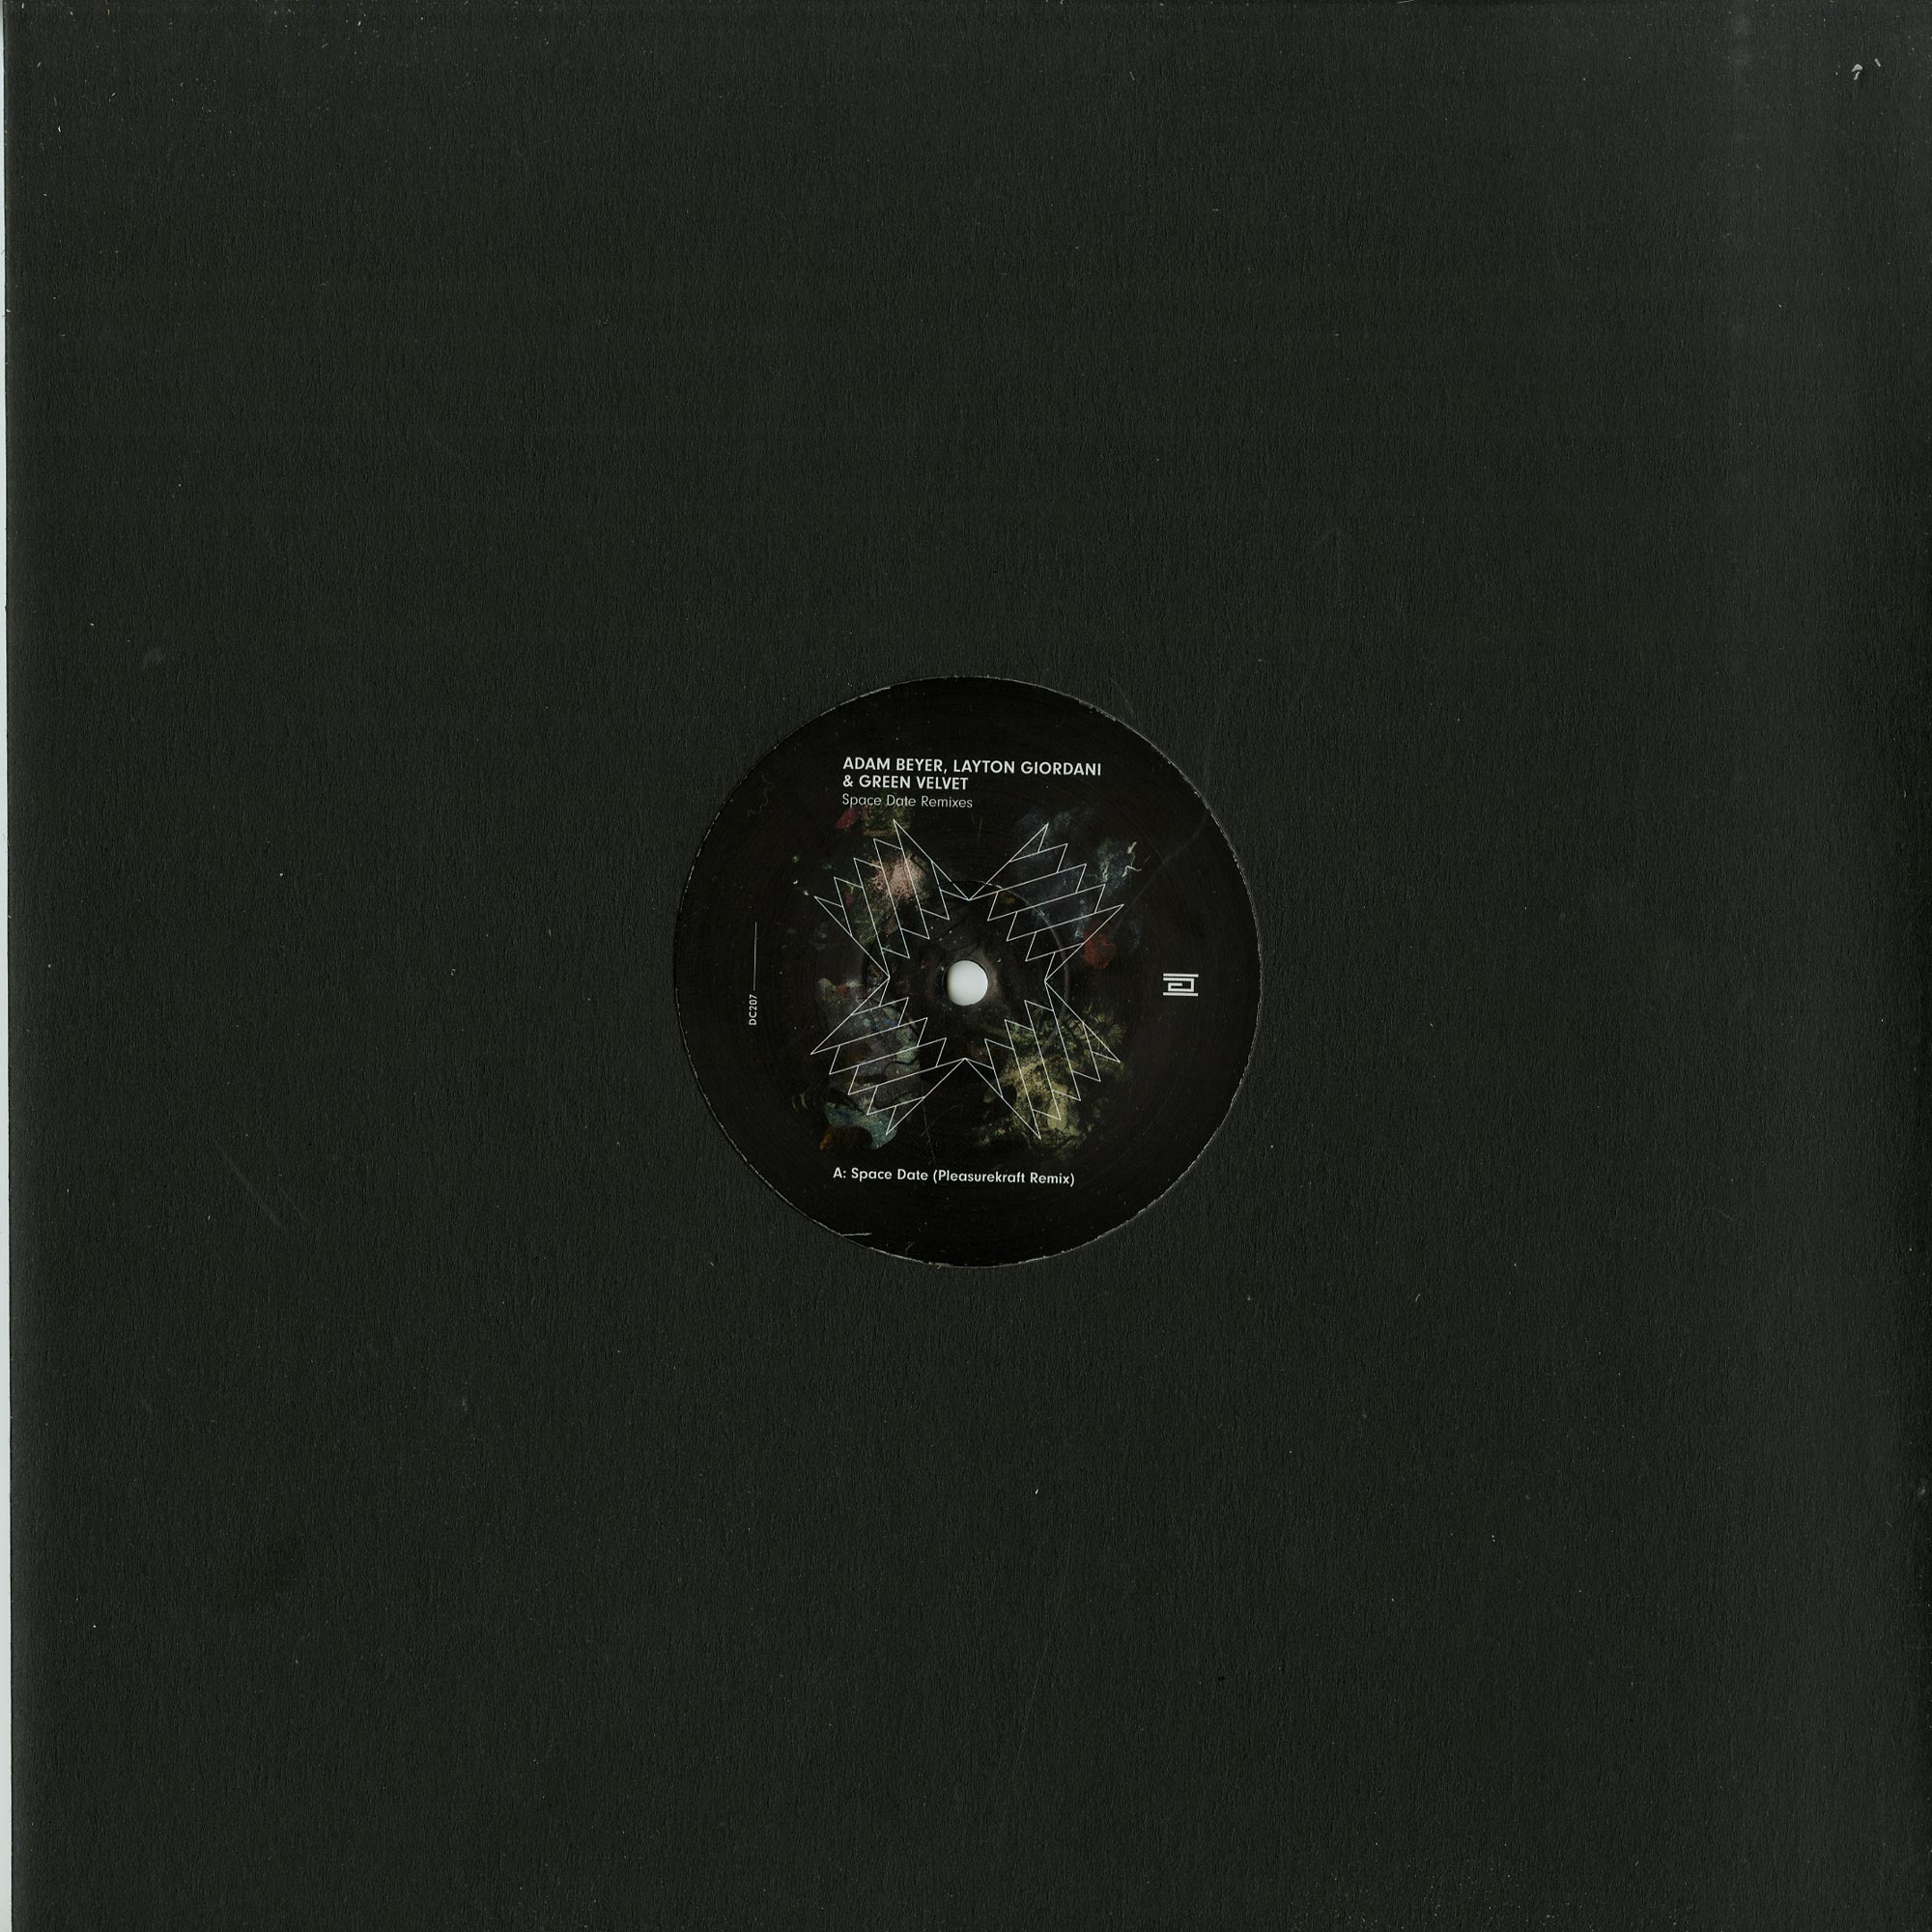 Adam Beyer, Layton Giordani & Green Velvet - SPACE DATE REMIXES